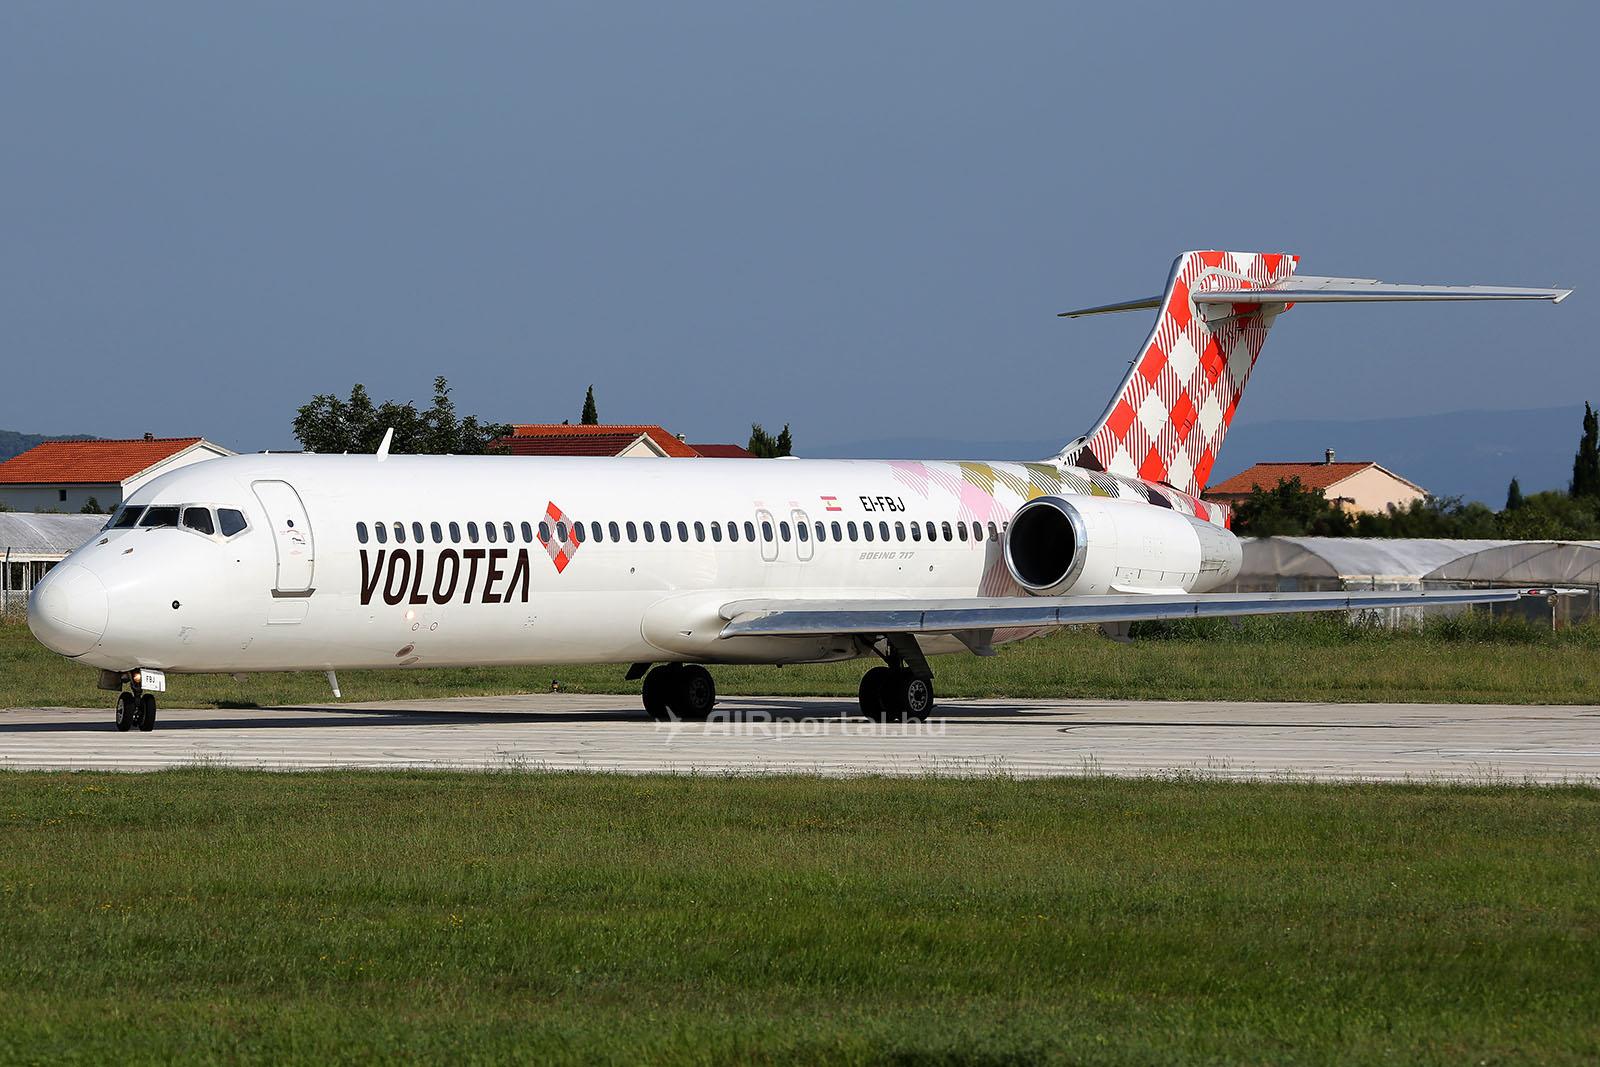 A Volotea Boeing 717-es repülőgépe. (Fotó: AIRportal.hu) | © AIRportal.hu